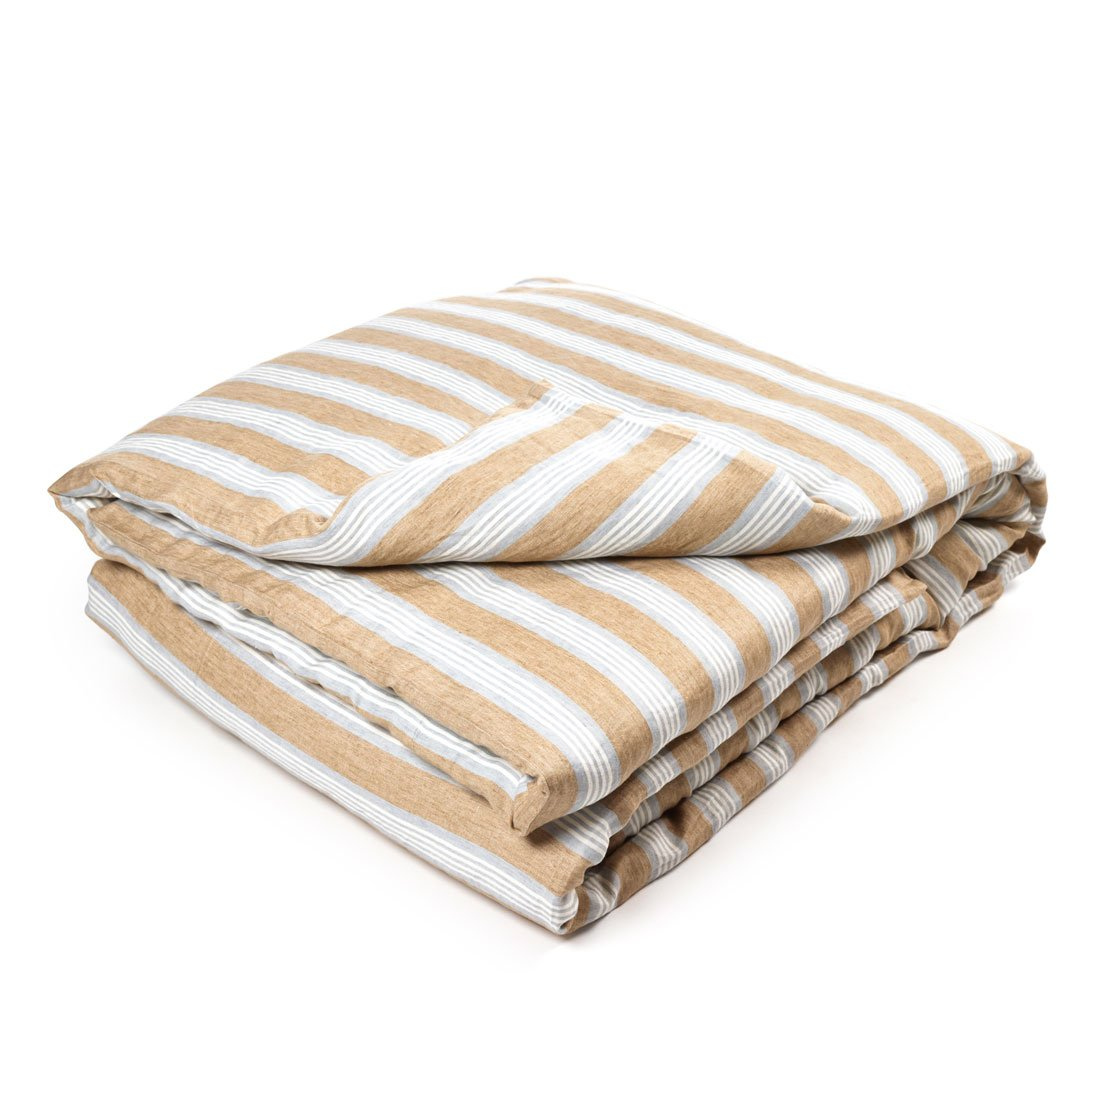 Leinen Bettbezug Maora 200x200 cm, Stripe - Libeco Home